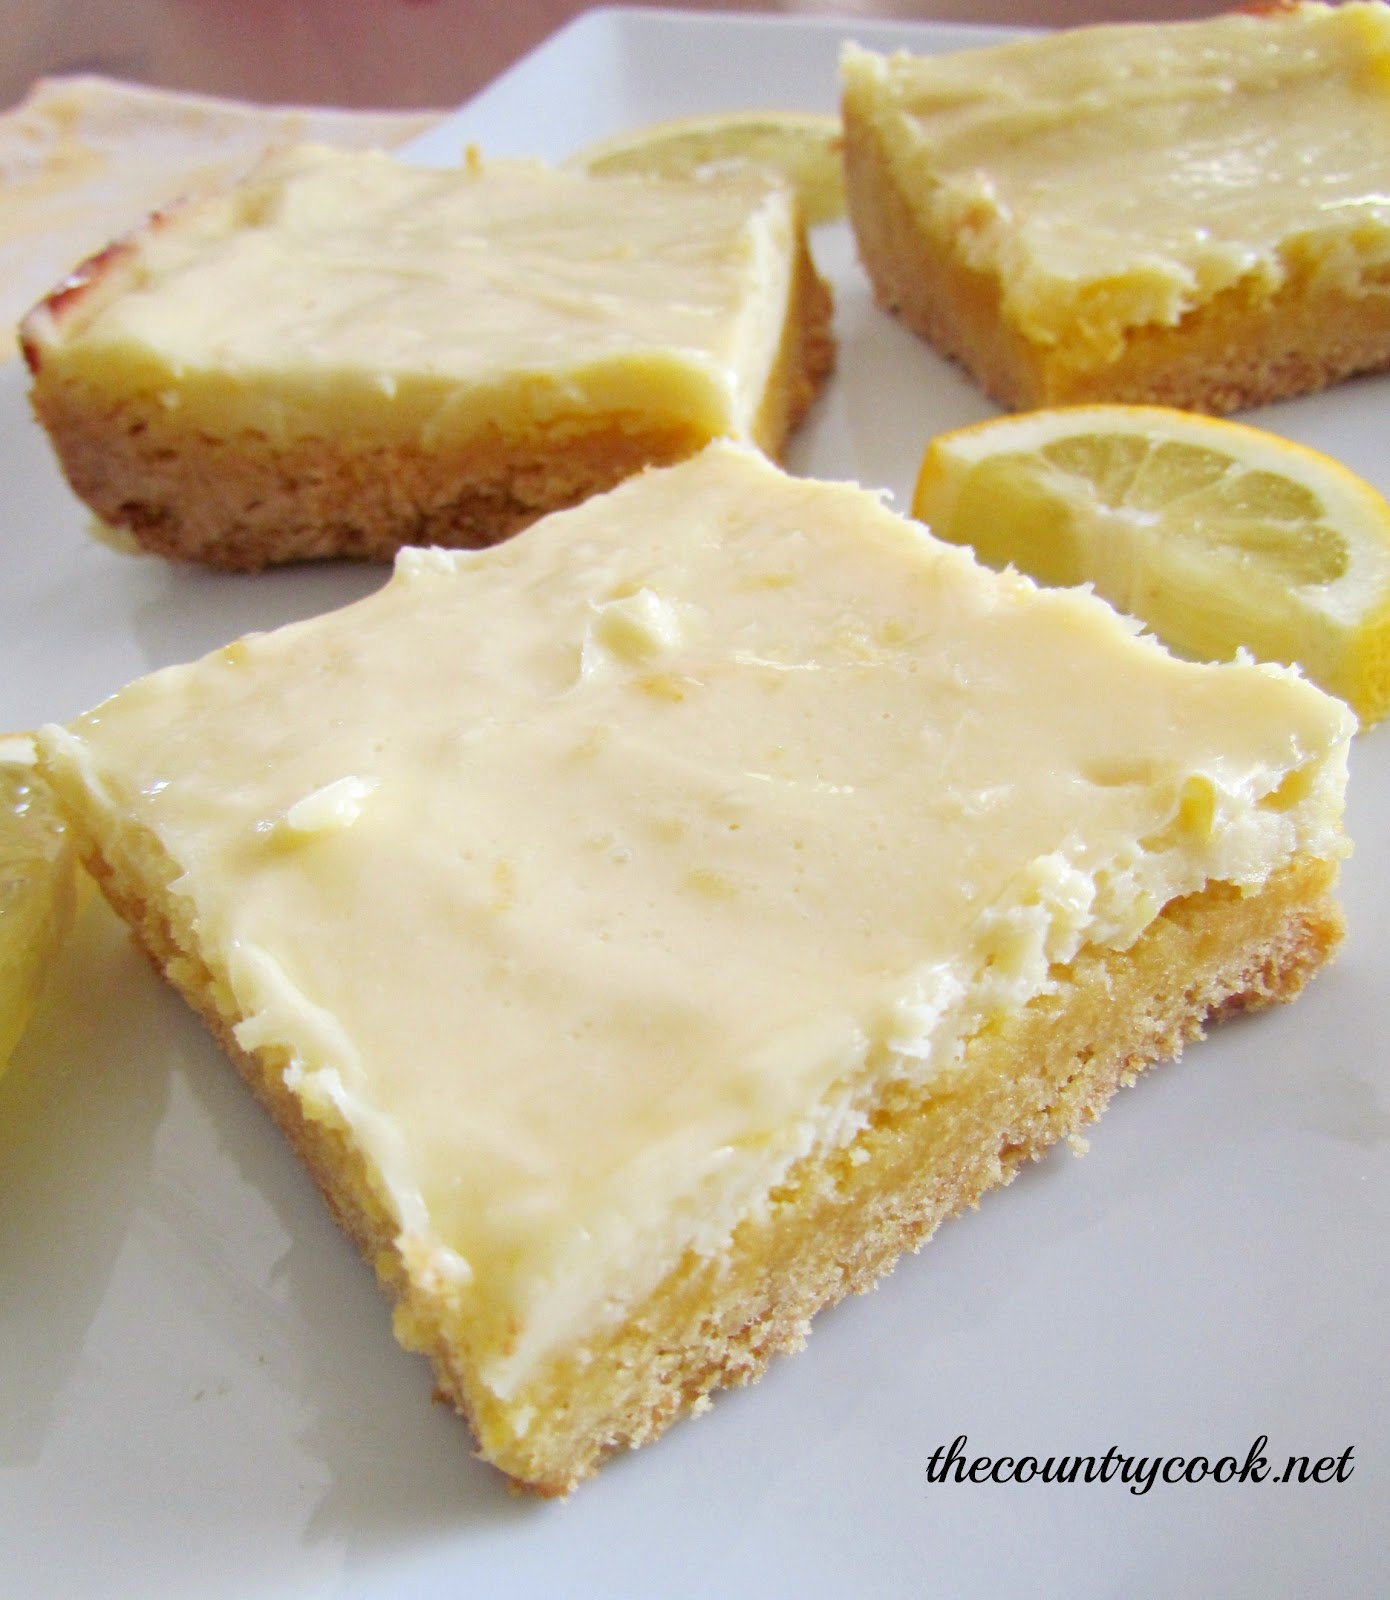 Lemon Bars With Cream Cheese And Cake Mix